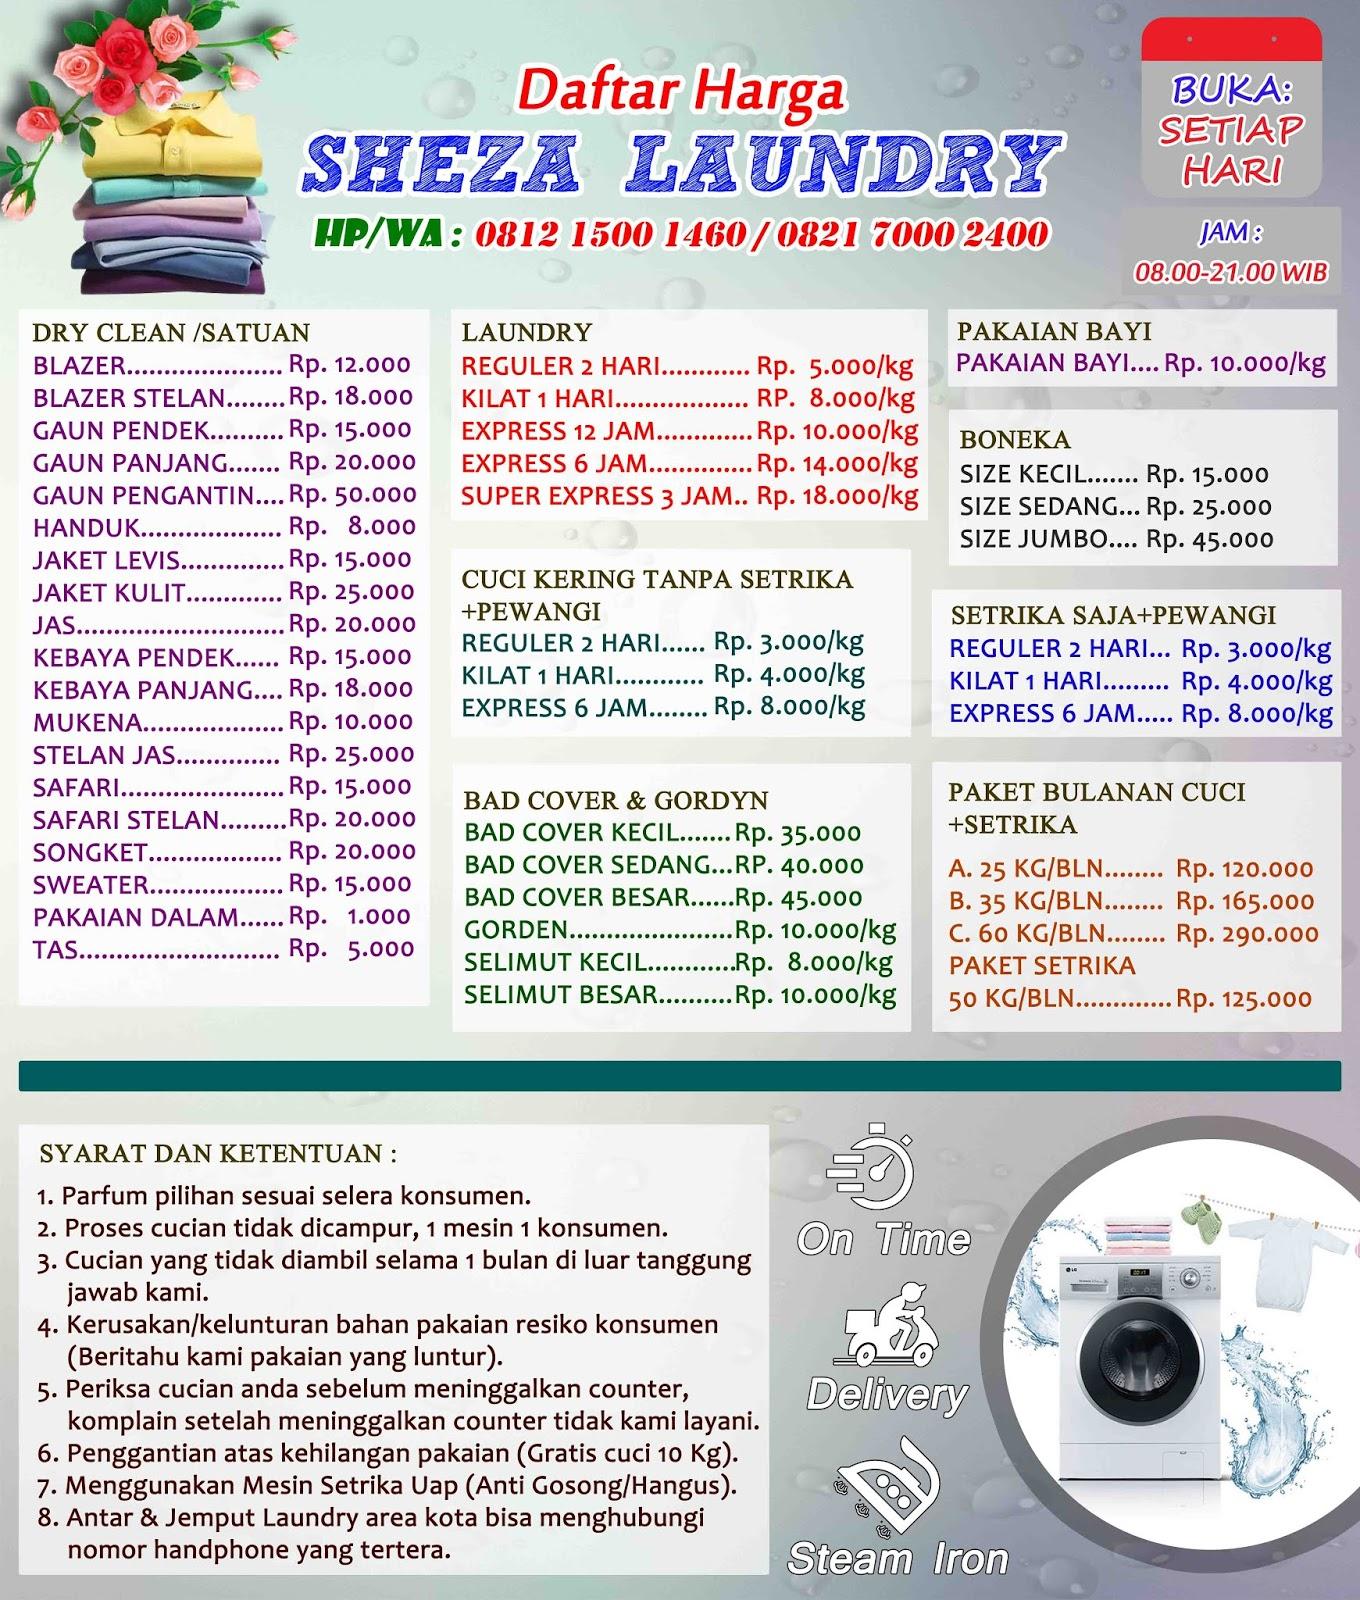 Contoh Desain Logo Laundry | Blog Garuda Cyber